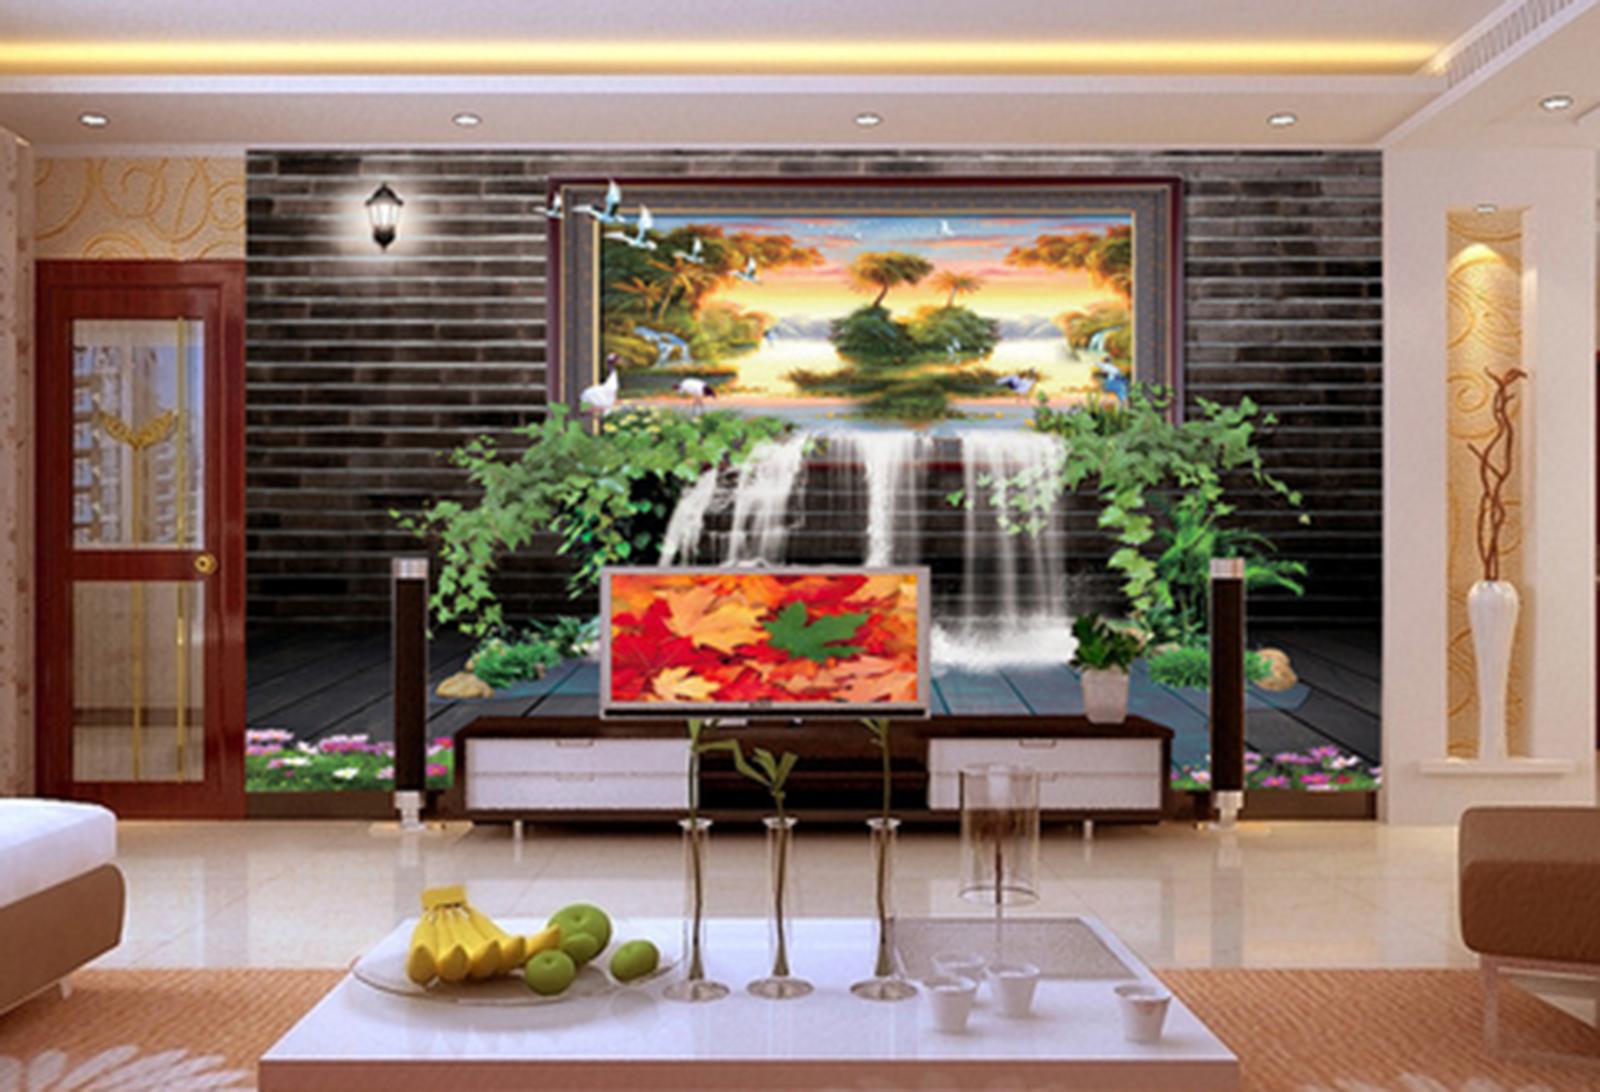 3D Stream Tree 495 Wallpaper Murals Wall Print Wallpaper Mural AJ WALL AU Kyra